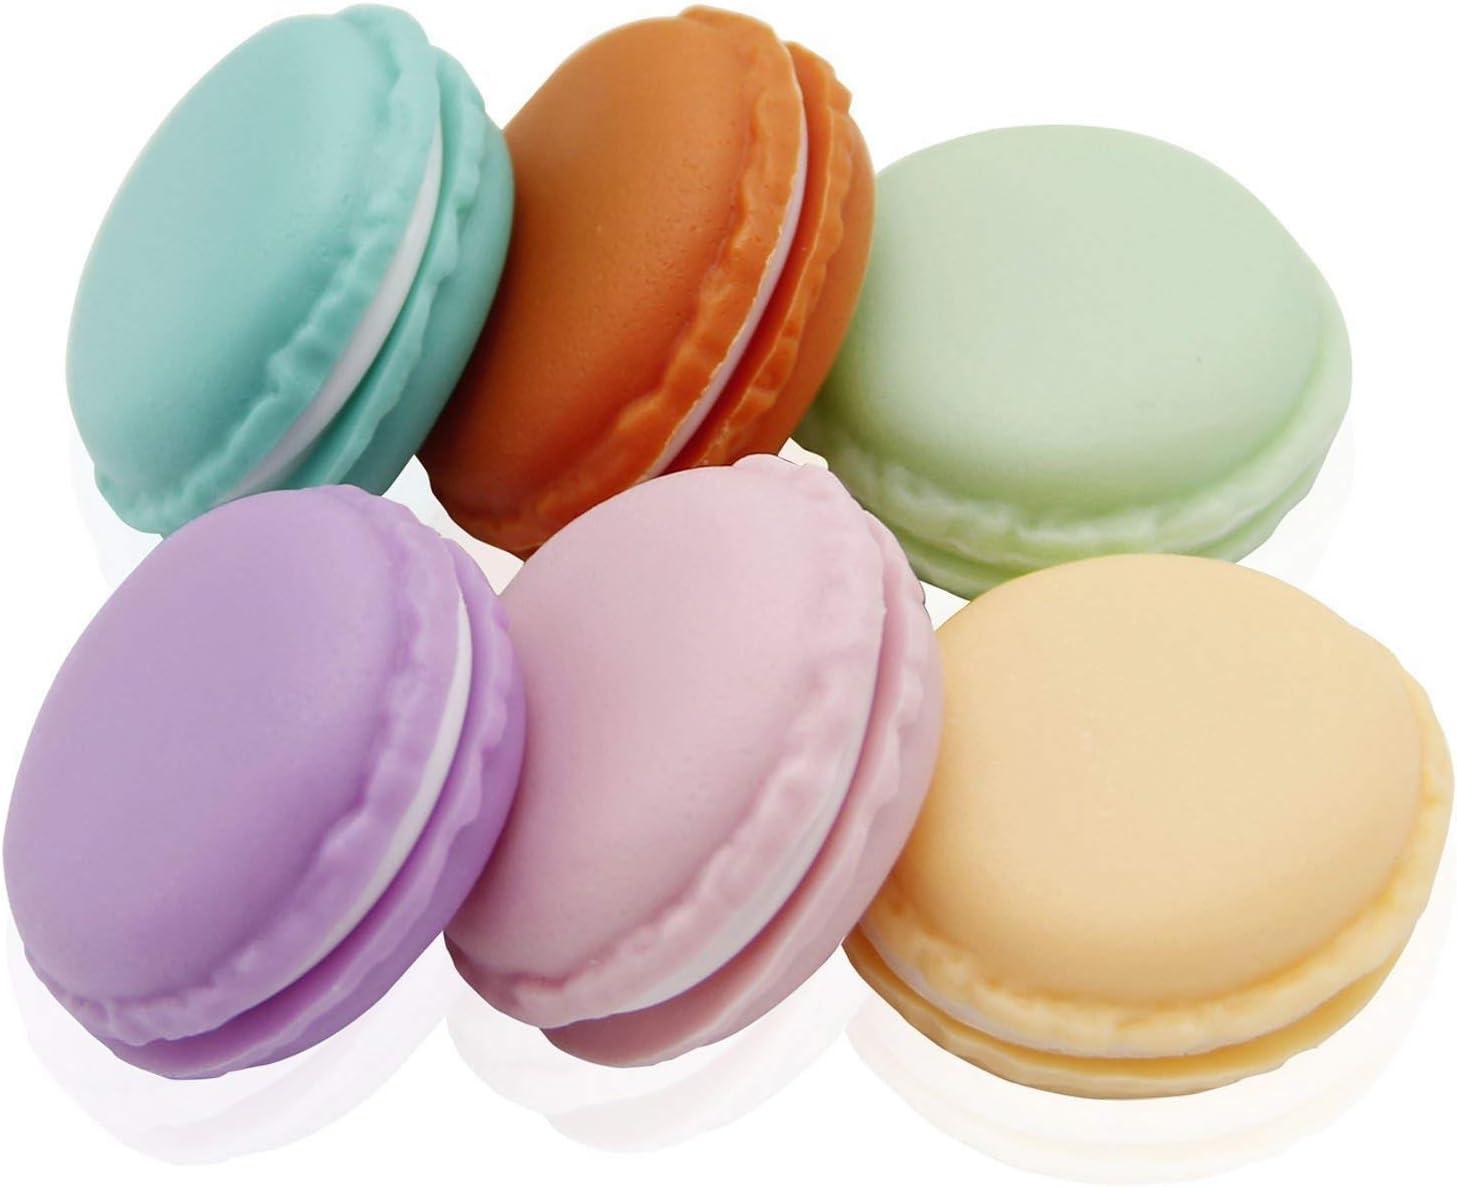 Coolrunner Macaron Case, Mini Macaron Box, Macaron Jewelry Box, Macaron Cute Pill Box, Colorful Macaron Jewelry Storage Box, Shape Storage Box Candy Cute Pill Organizer Case Container(6 PCS): Home & Kitchen